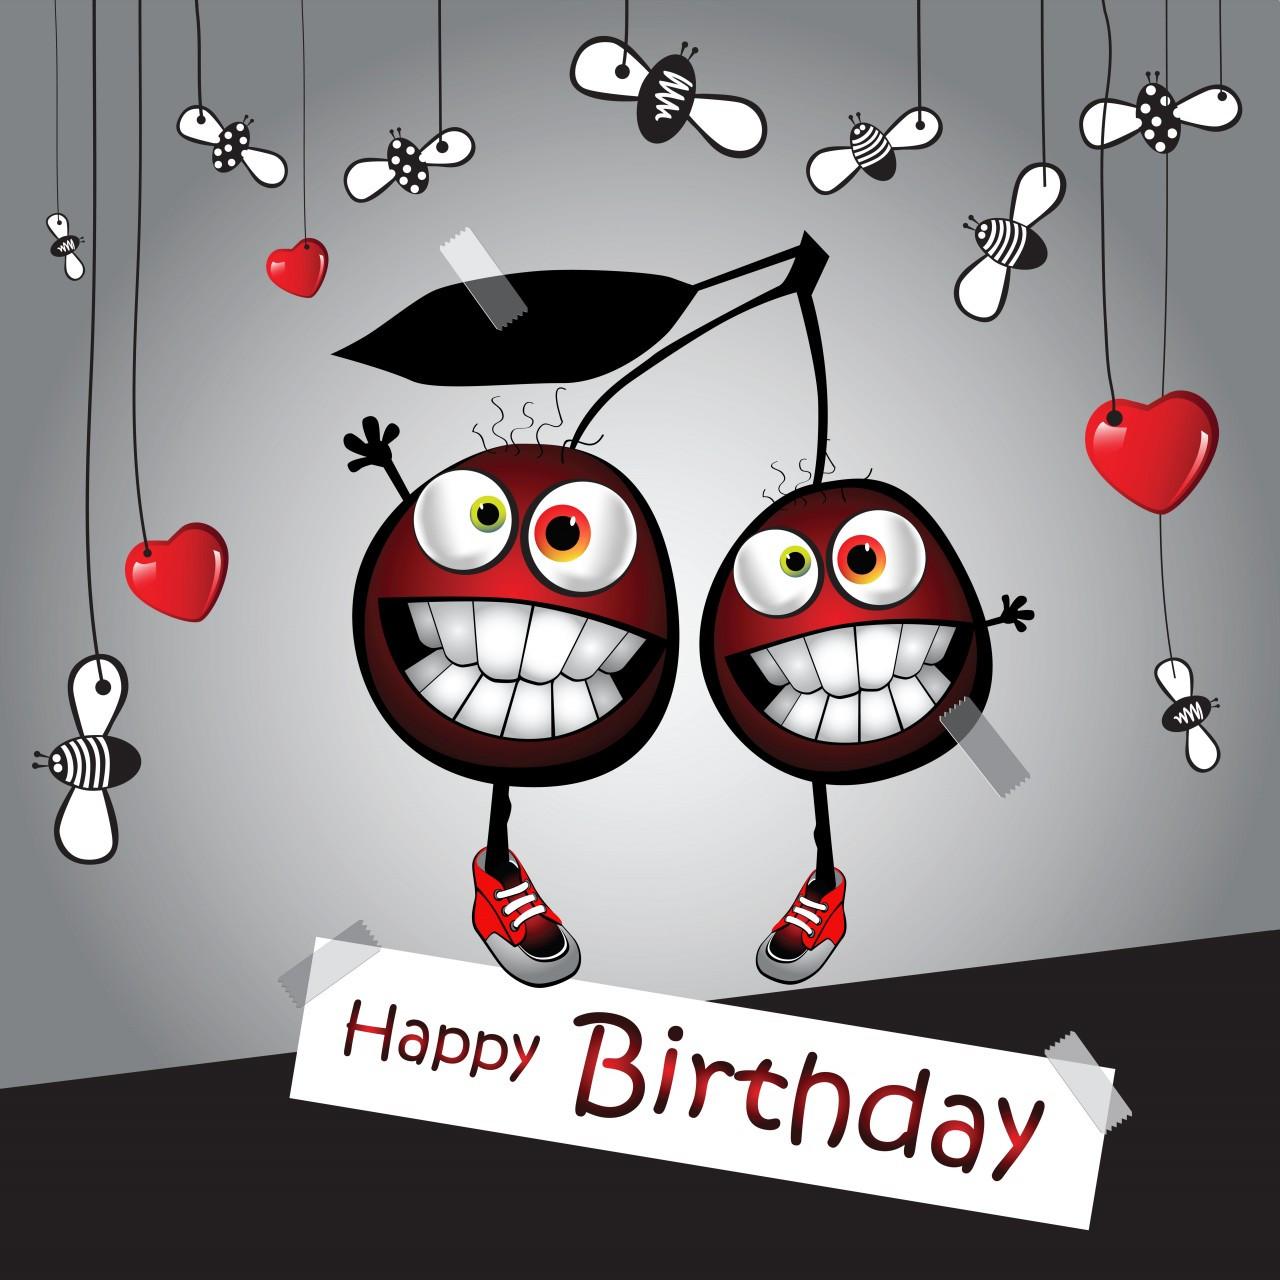 Happy Birthday Images Funny  happy birthday funny Free